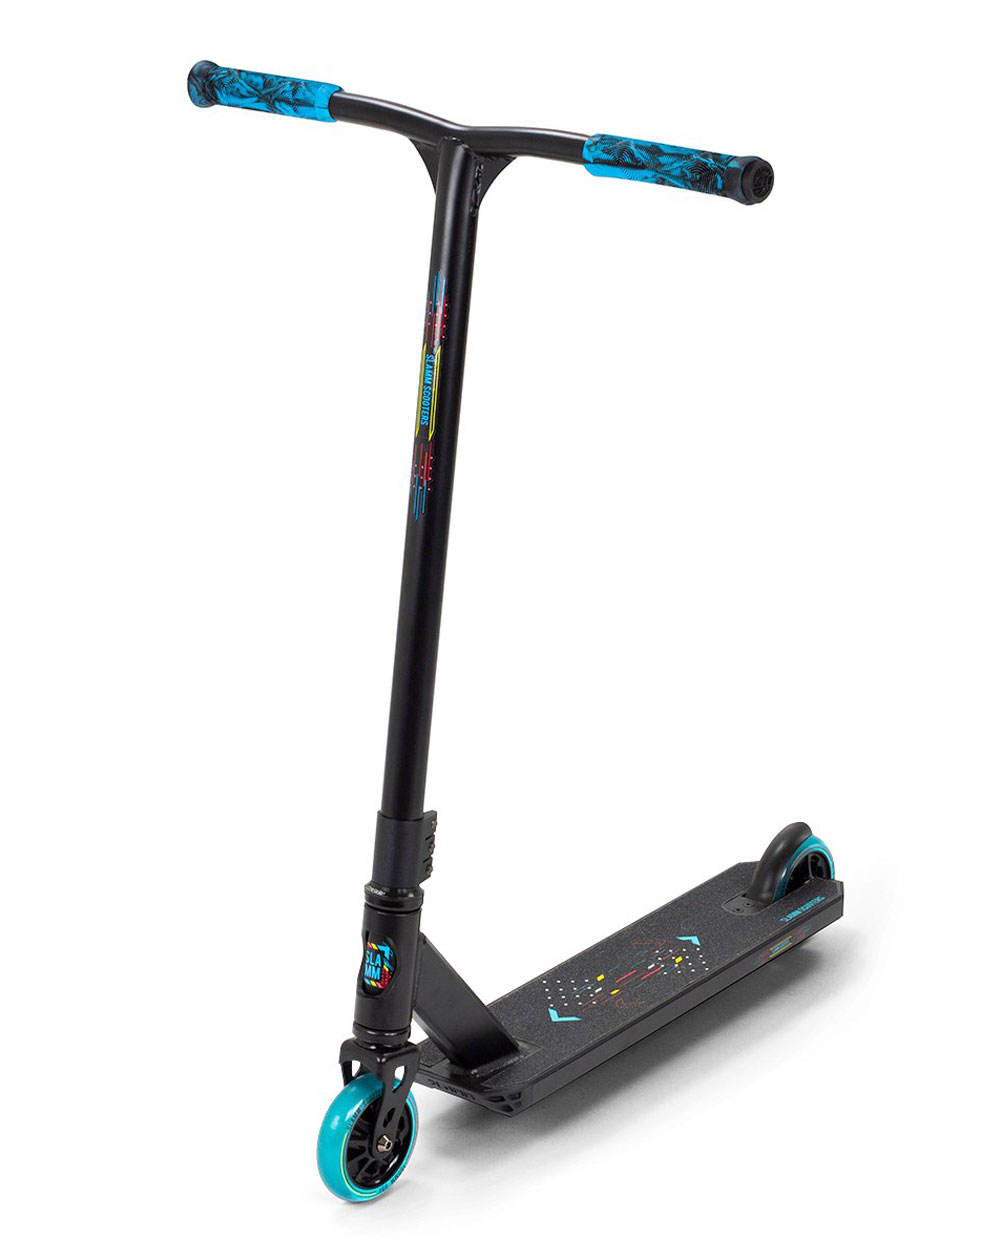 Slamm Scooters Classic V9 Stunt Scooter Black/Blue